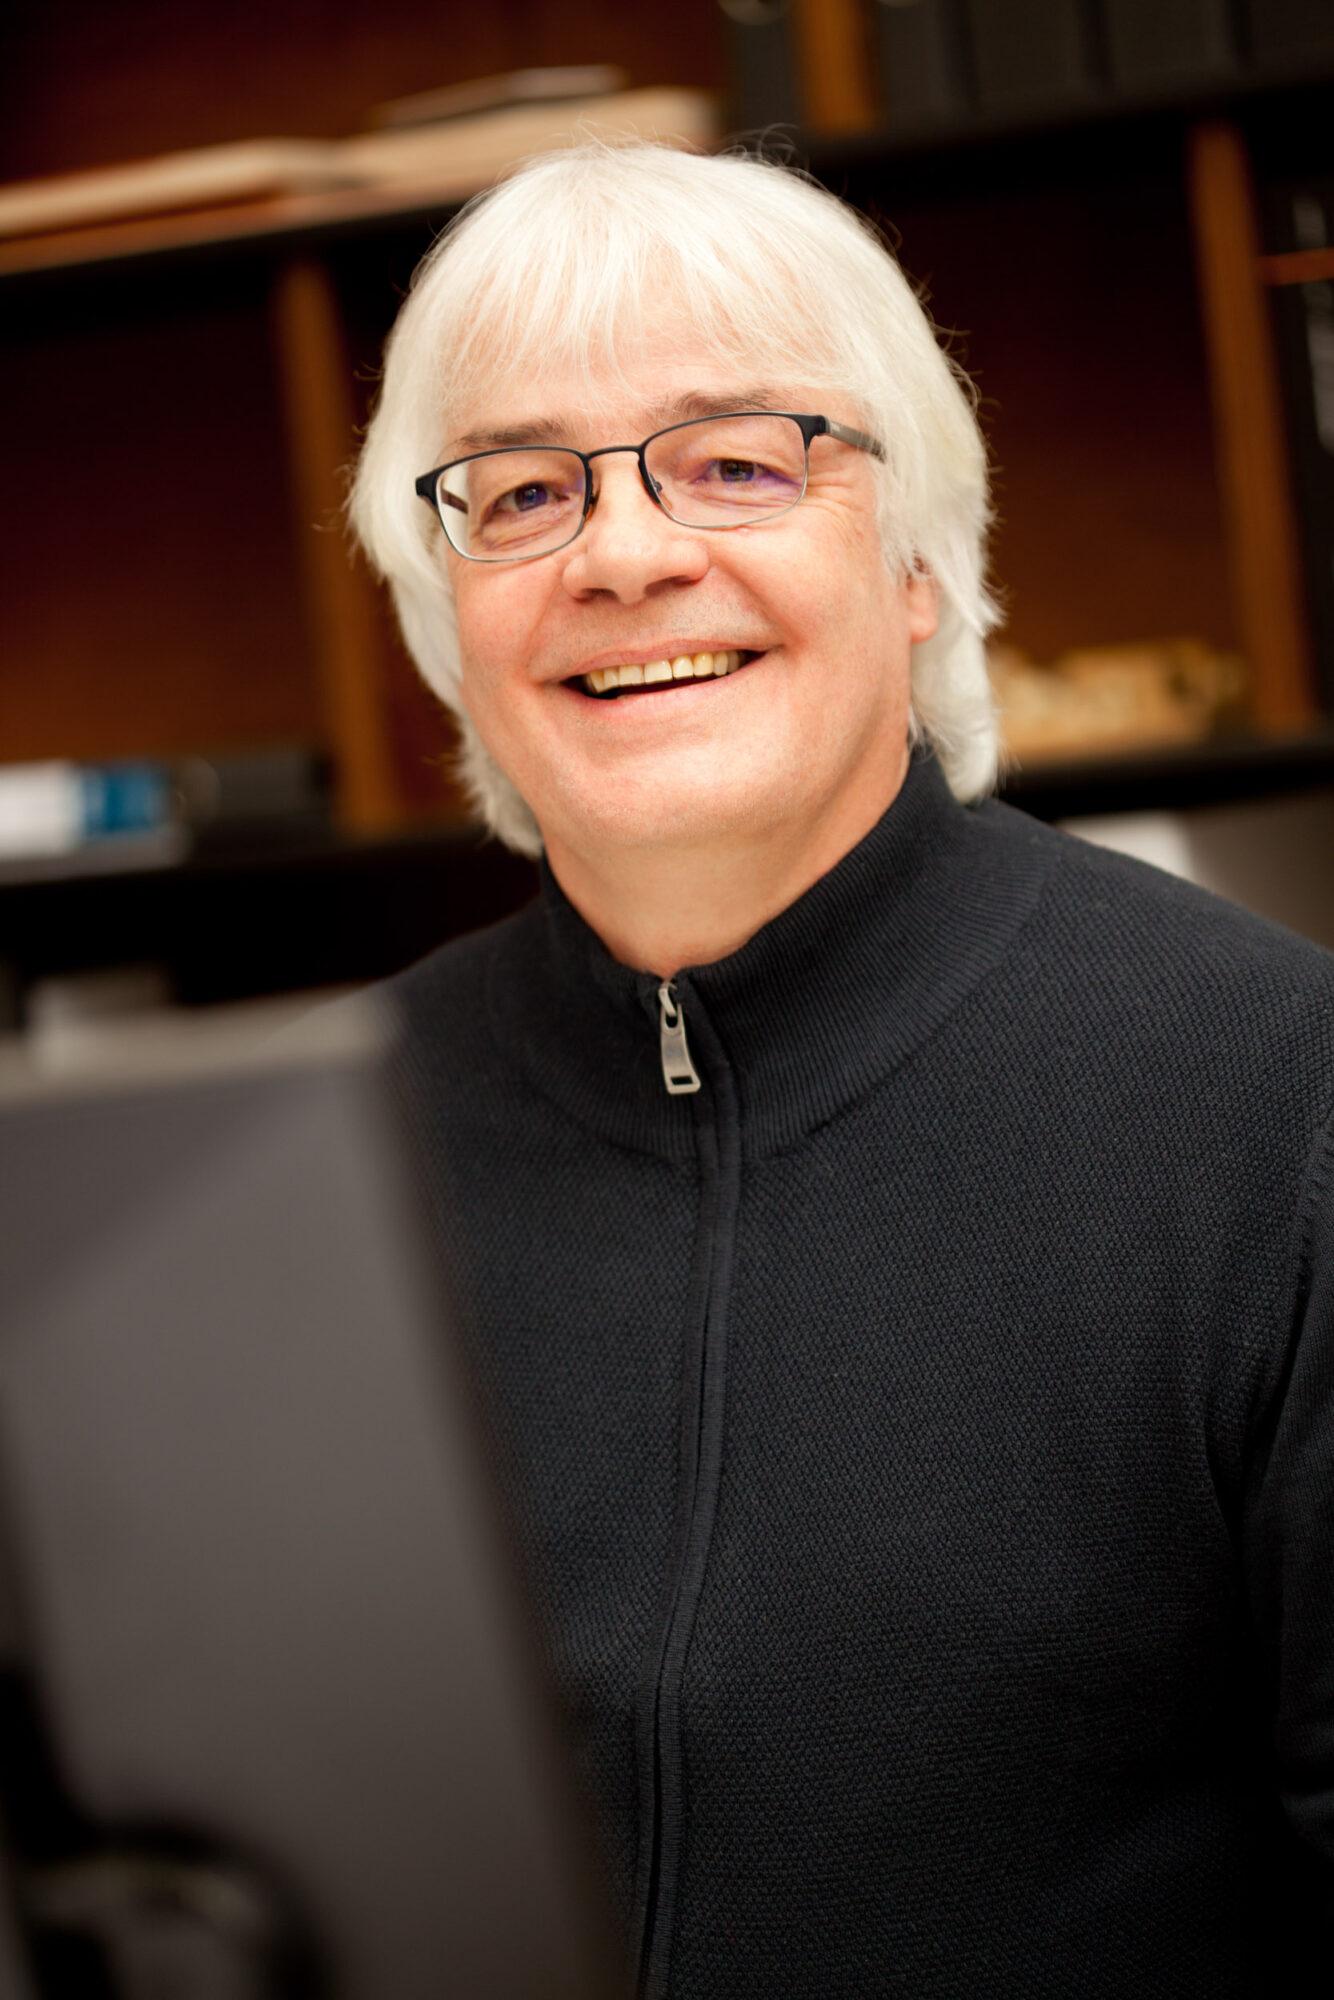 Ekkehard Gnadler - gmw planungsgesellschaft mbH Stralsund